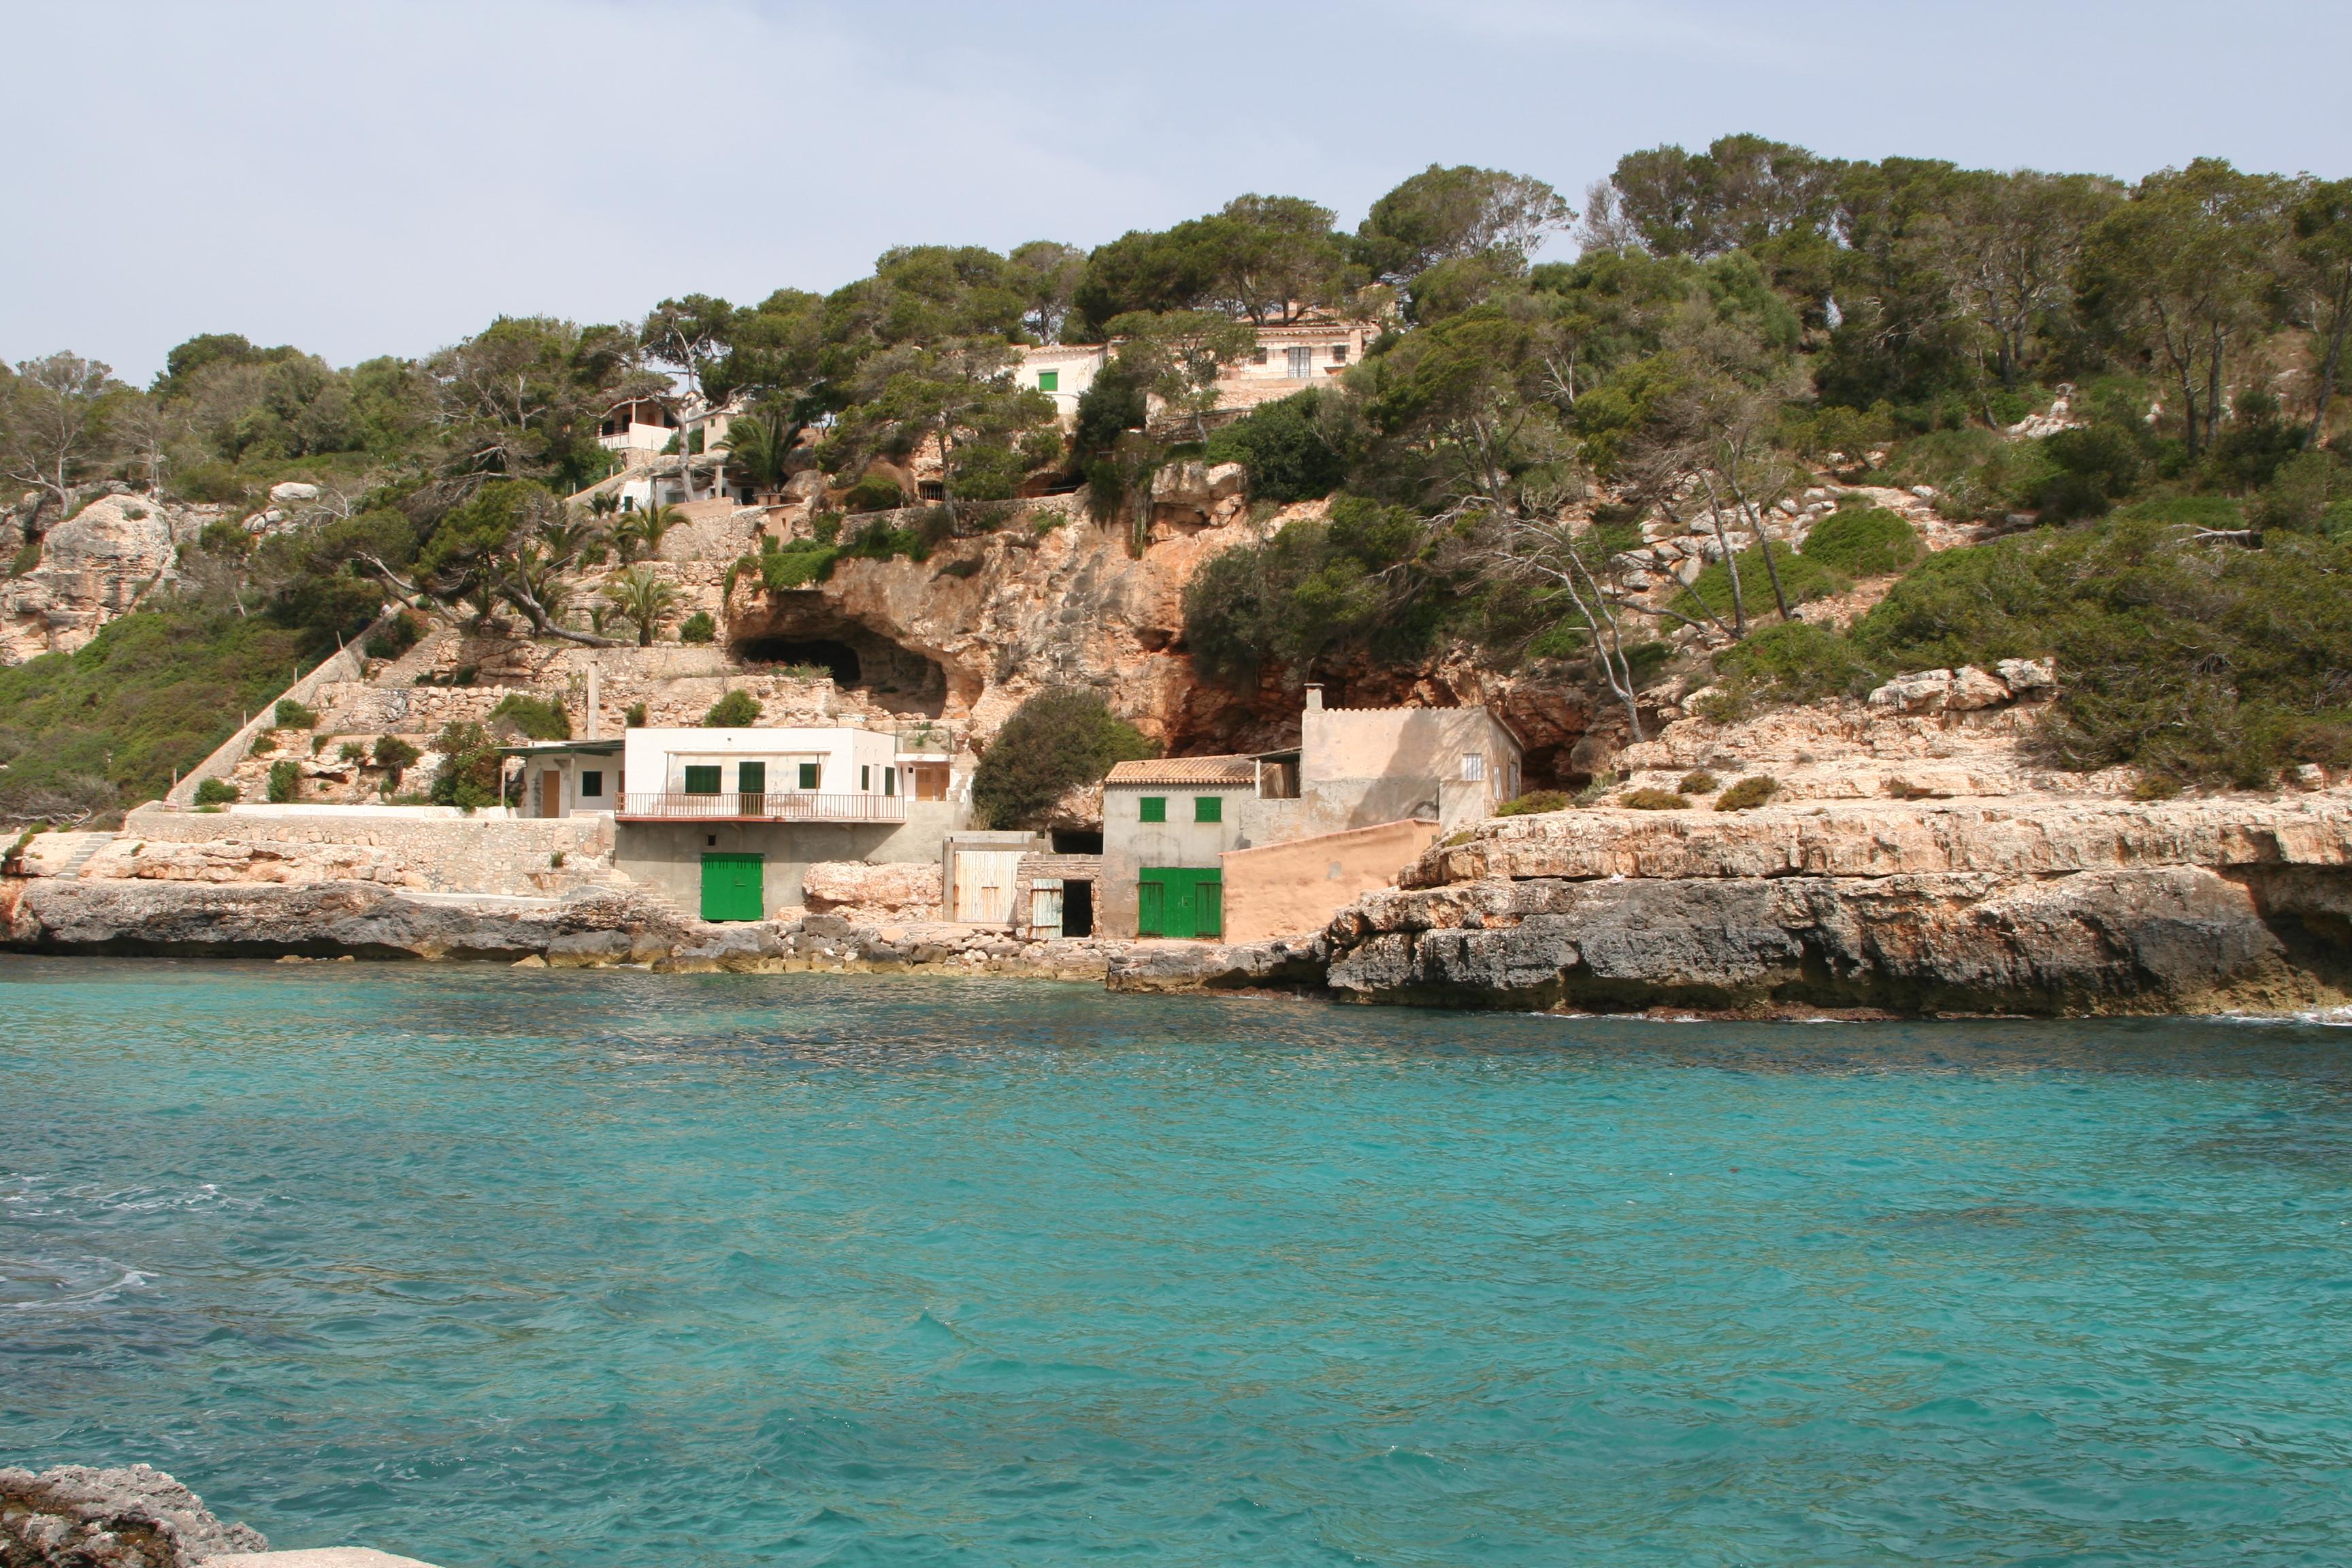 Cala Llombards : Immobilien in Cala Llombards de Mallorca - Immobilienmakler ...